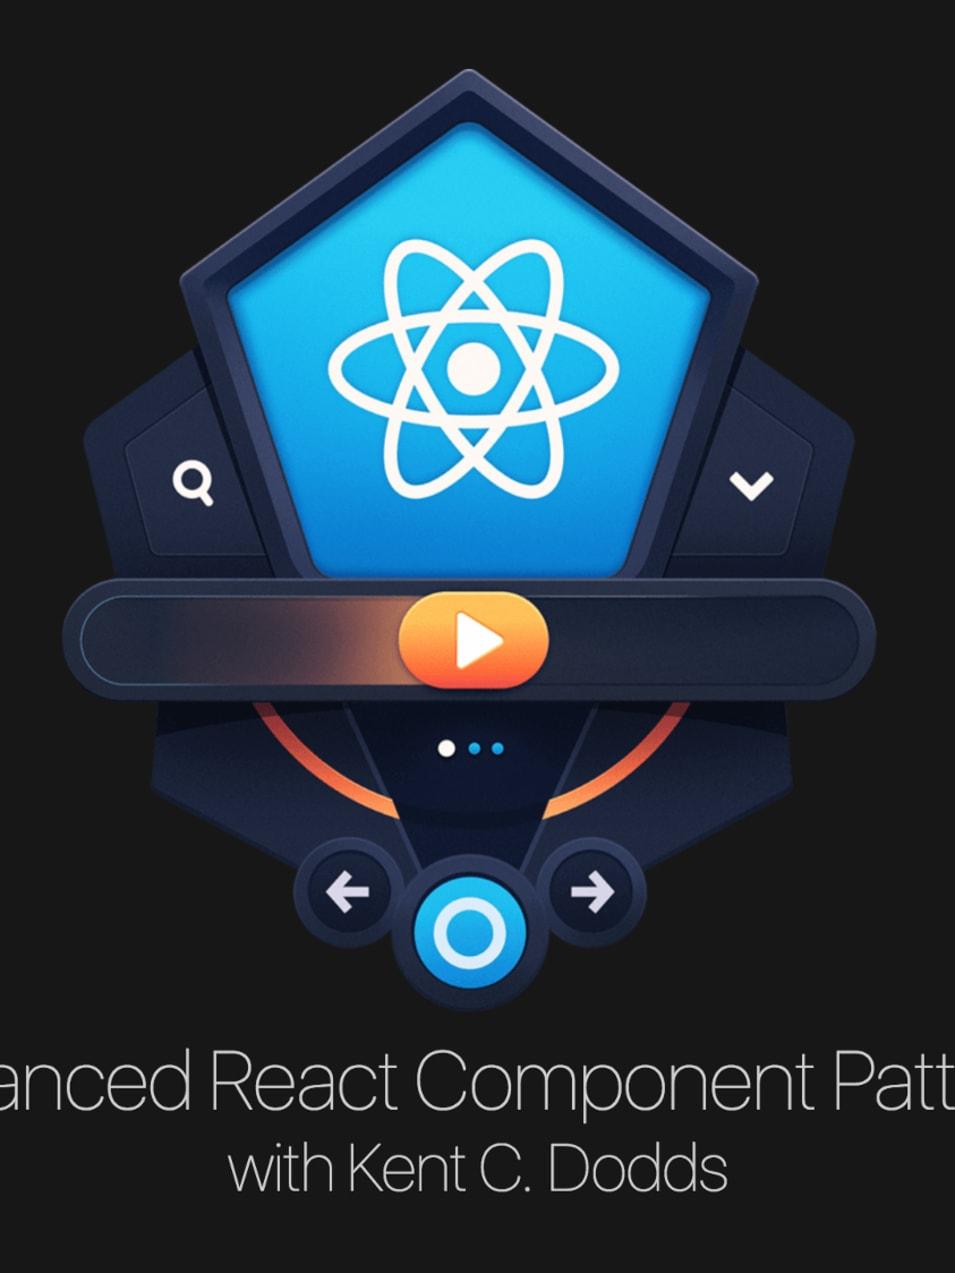 [Advanced React Component Patterns](http://kcd.im/advanced-react) with [Kent C. Dodds](https://twitter.com/kentcdodds) (art by [Maggie Appleton](https://twitter.com/Mappletons))